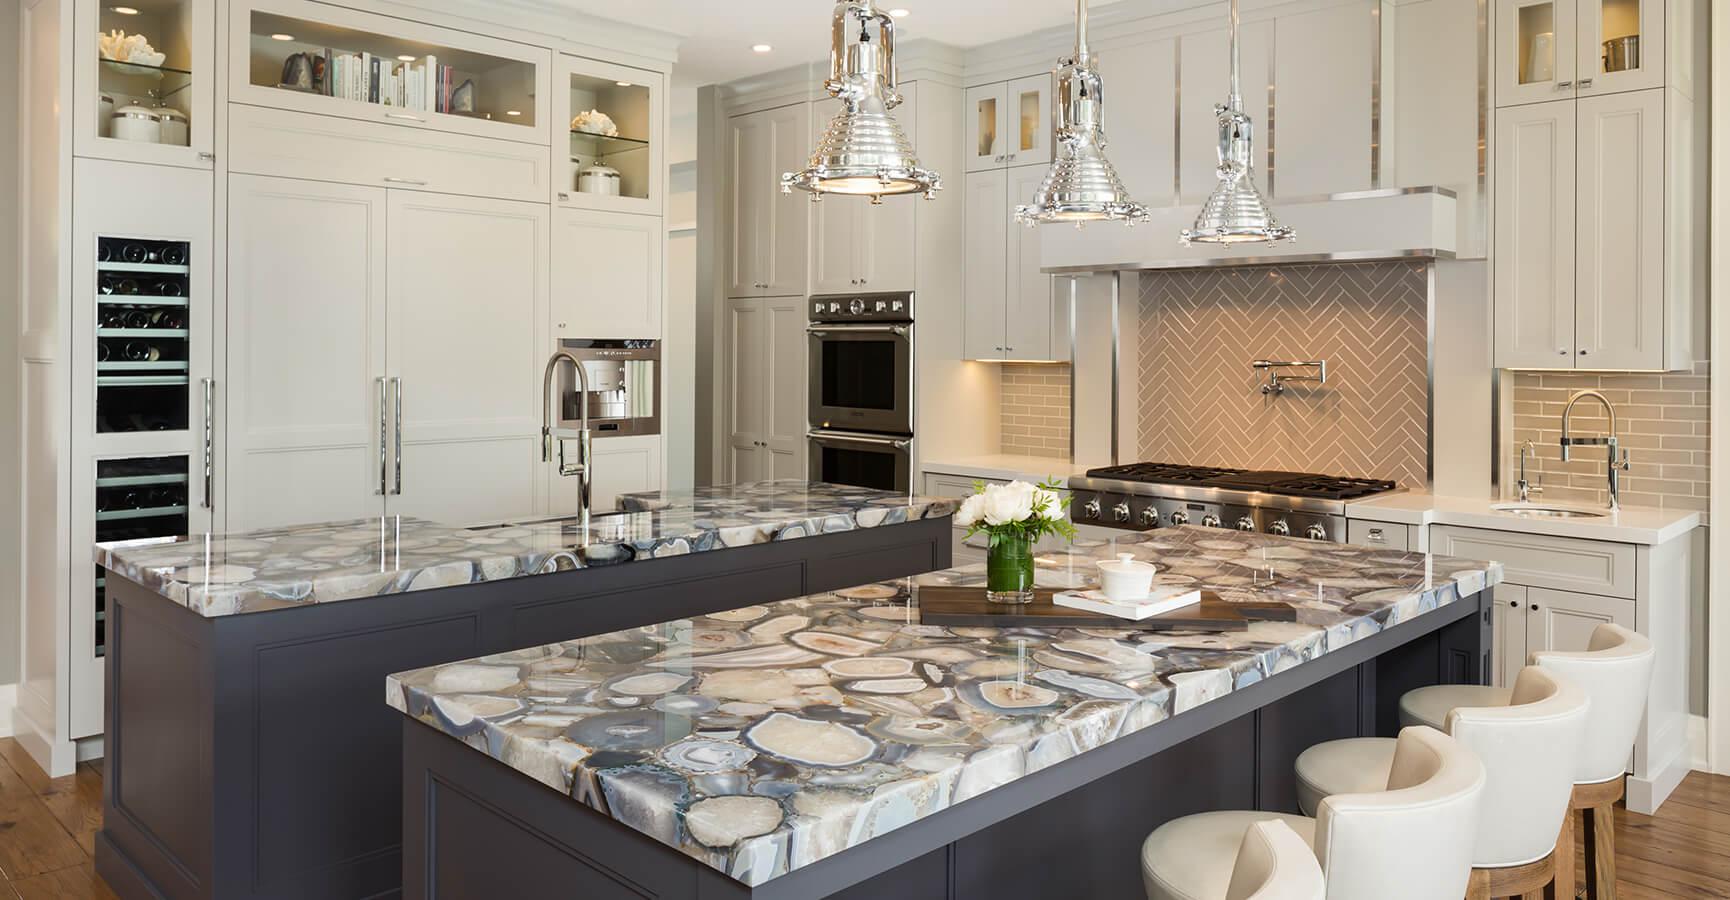 Custom Kitchen Design With Breakfast Bar